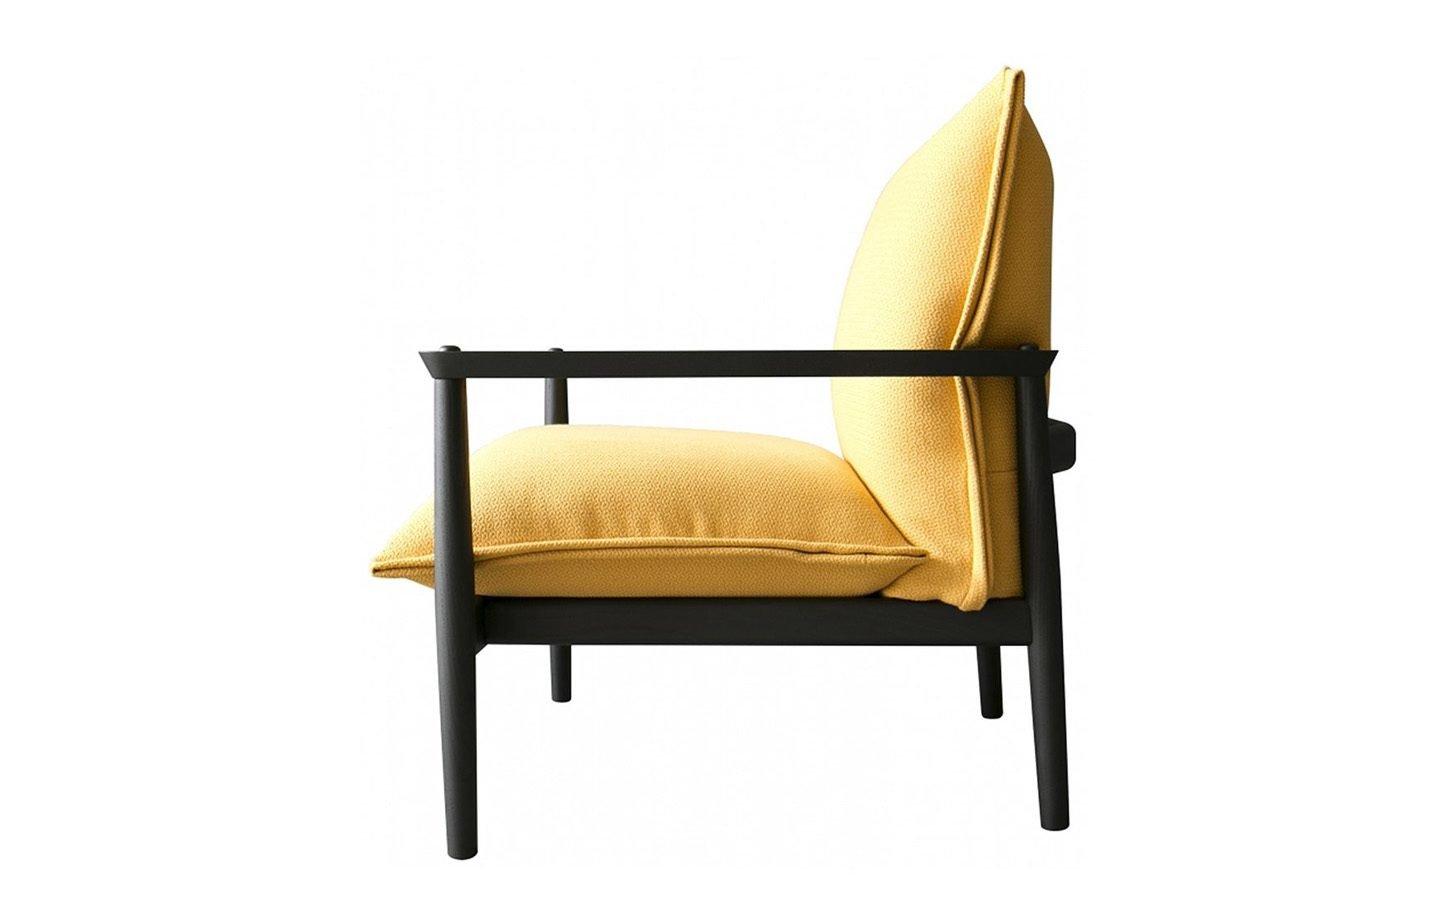 Sergia-designer-lounge-Armchair-wood-02